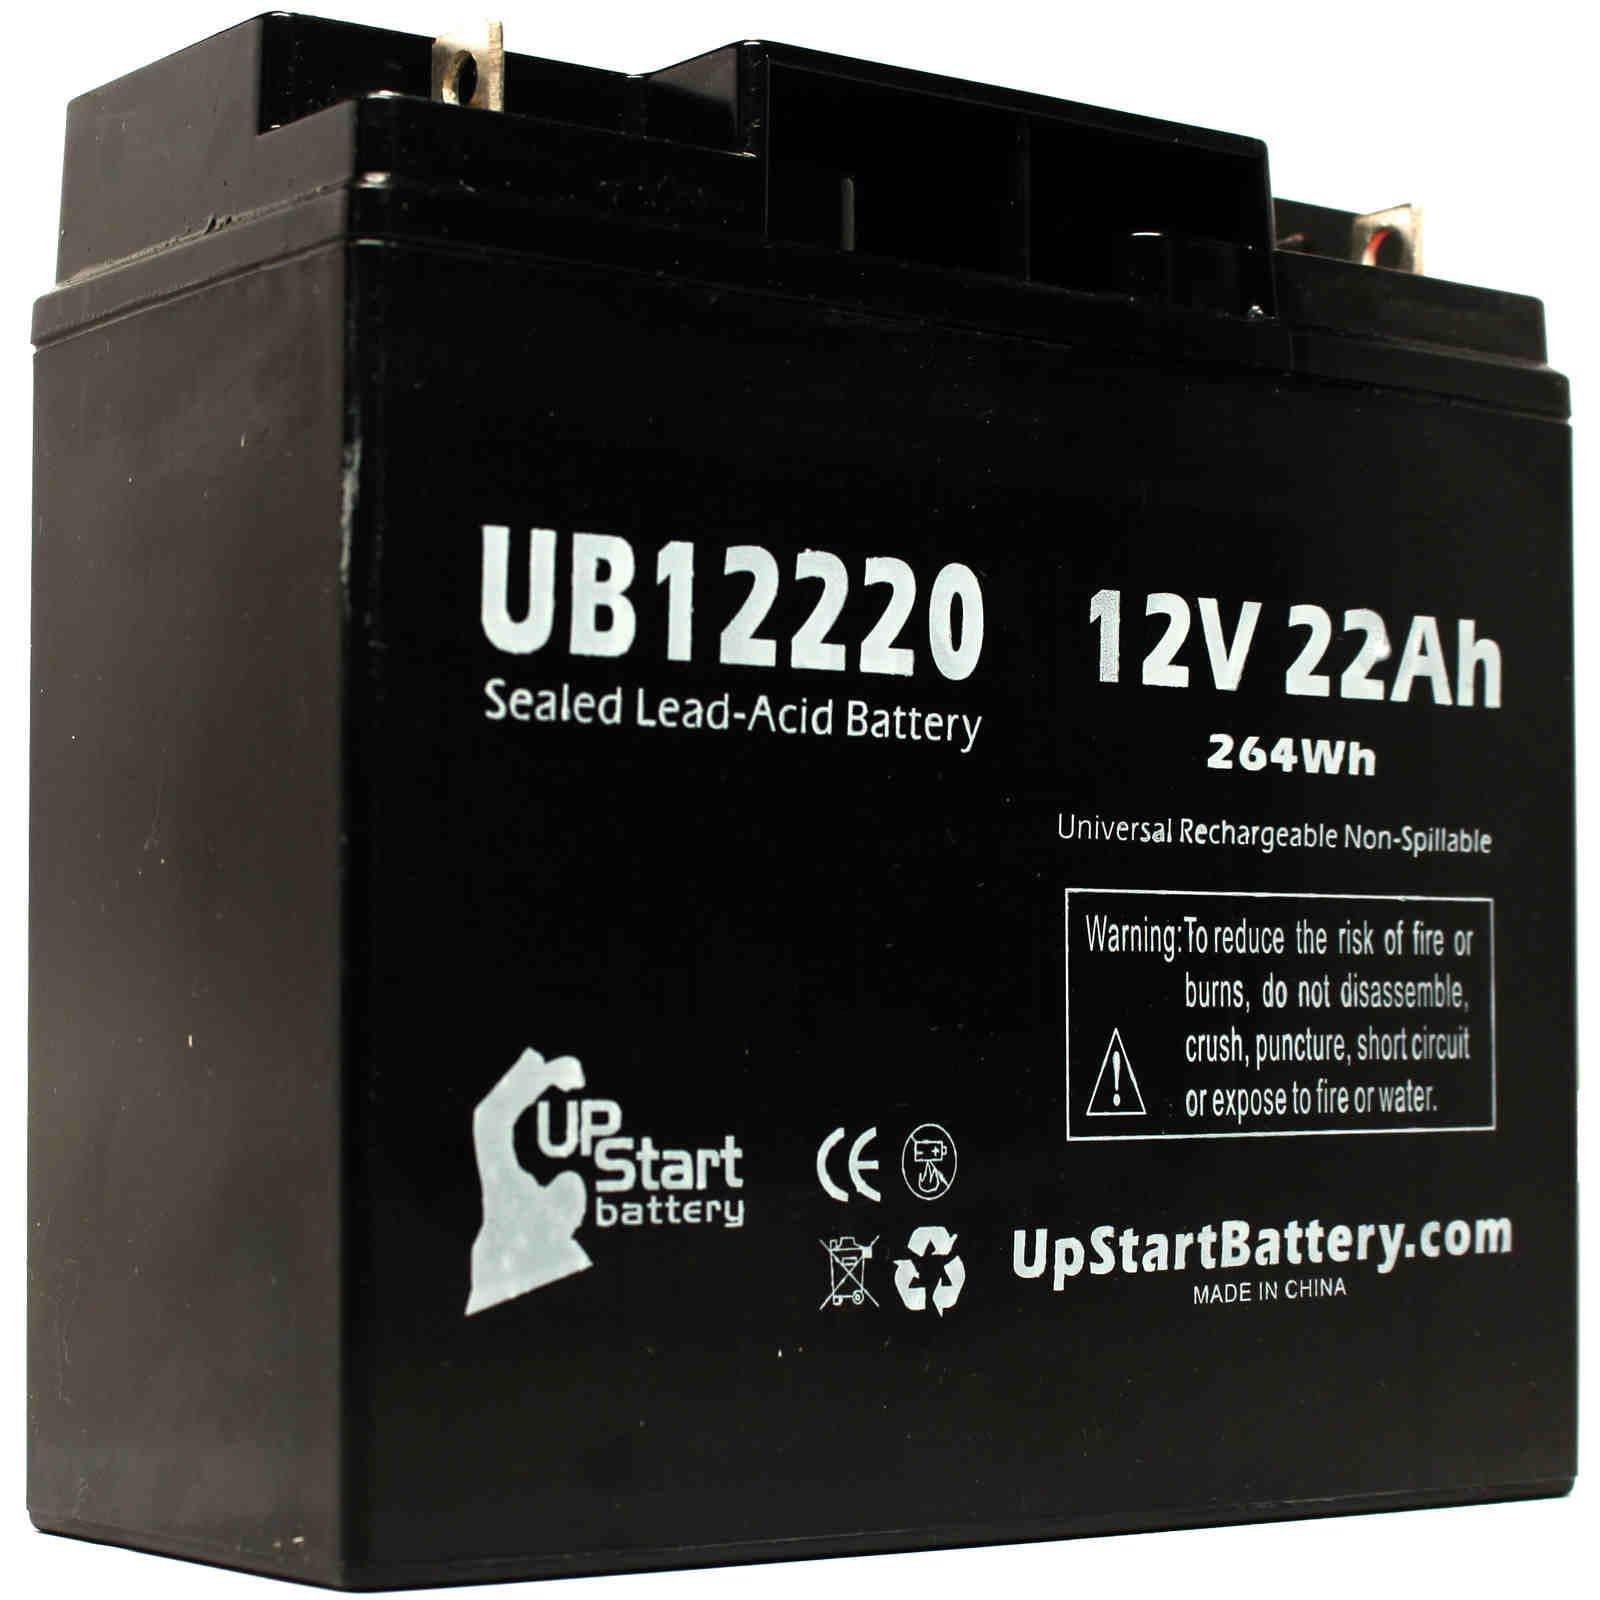 2x Pack - Panasonic LC-RD1217P Battery Replacement - UB12220 Universal Sealed Lead Acid Battery (12V, 22Ah, 22000mAh, T4 Terminal, AGM, SLA) - image 2 de 4